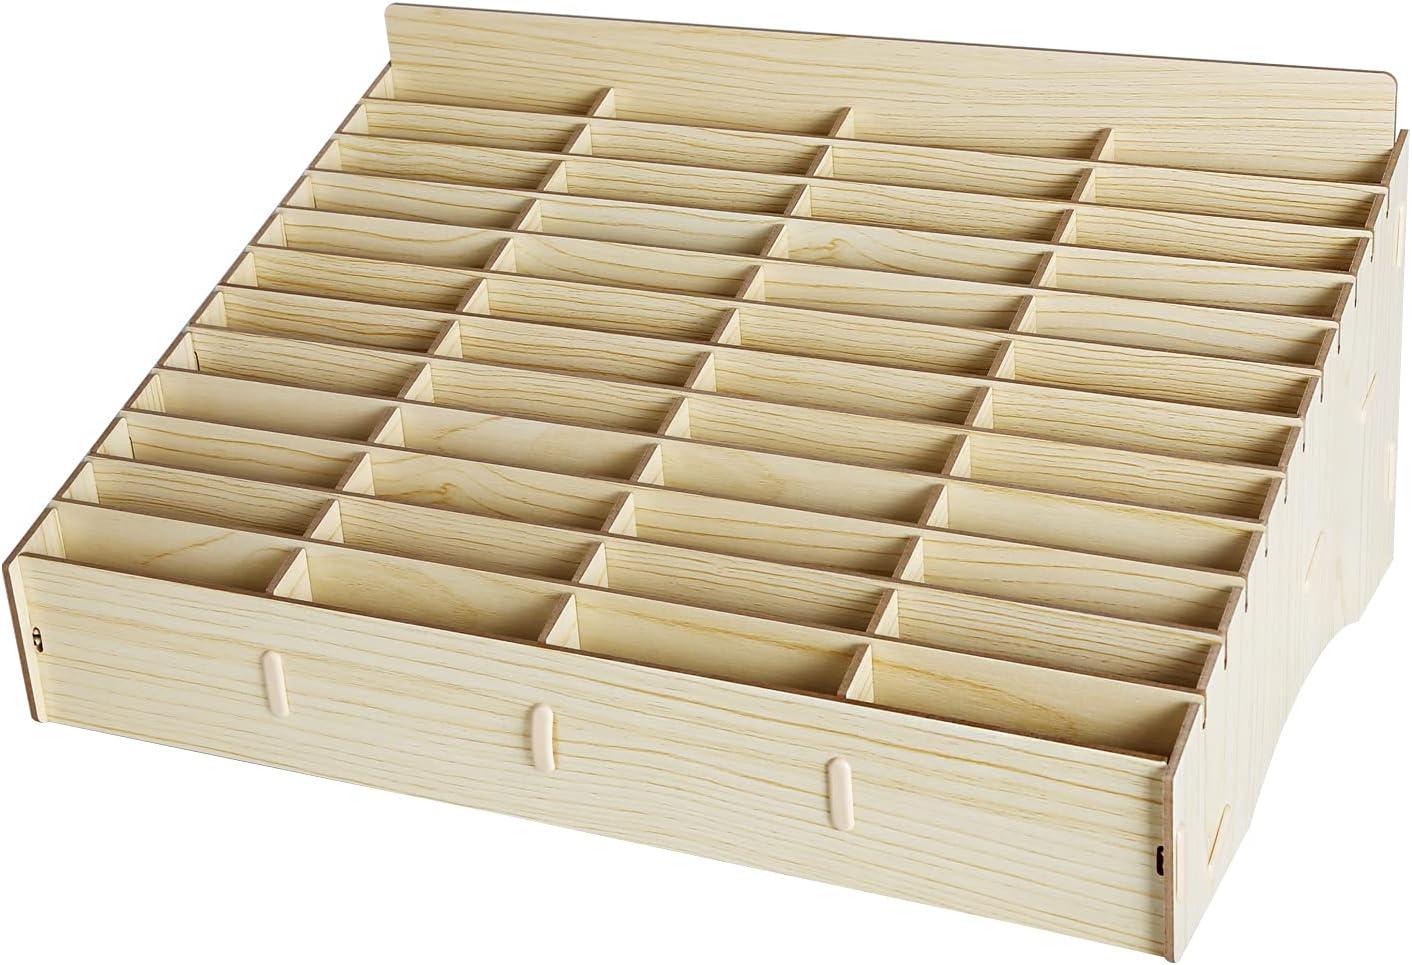 HTM 48 Grid Wooden Cell Phone outlet Storage B Holder Organizer Desktop Dealing full price reduction